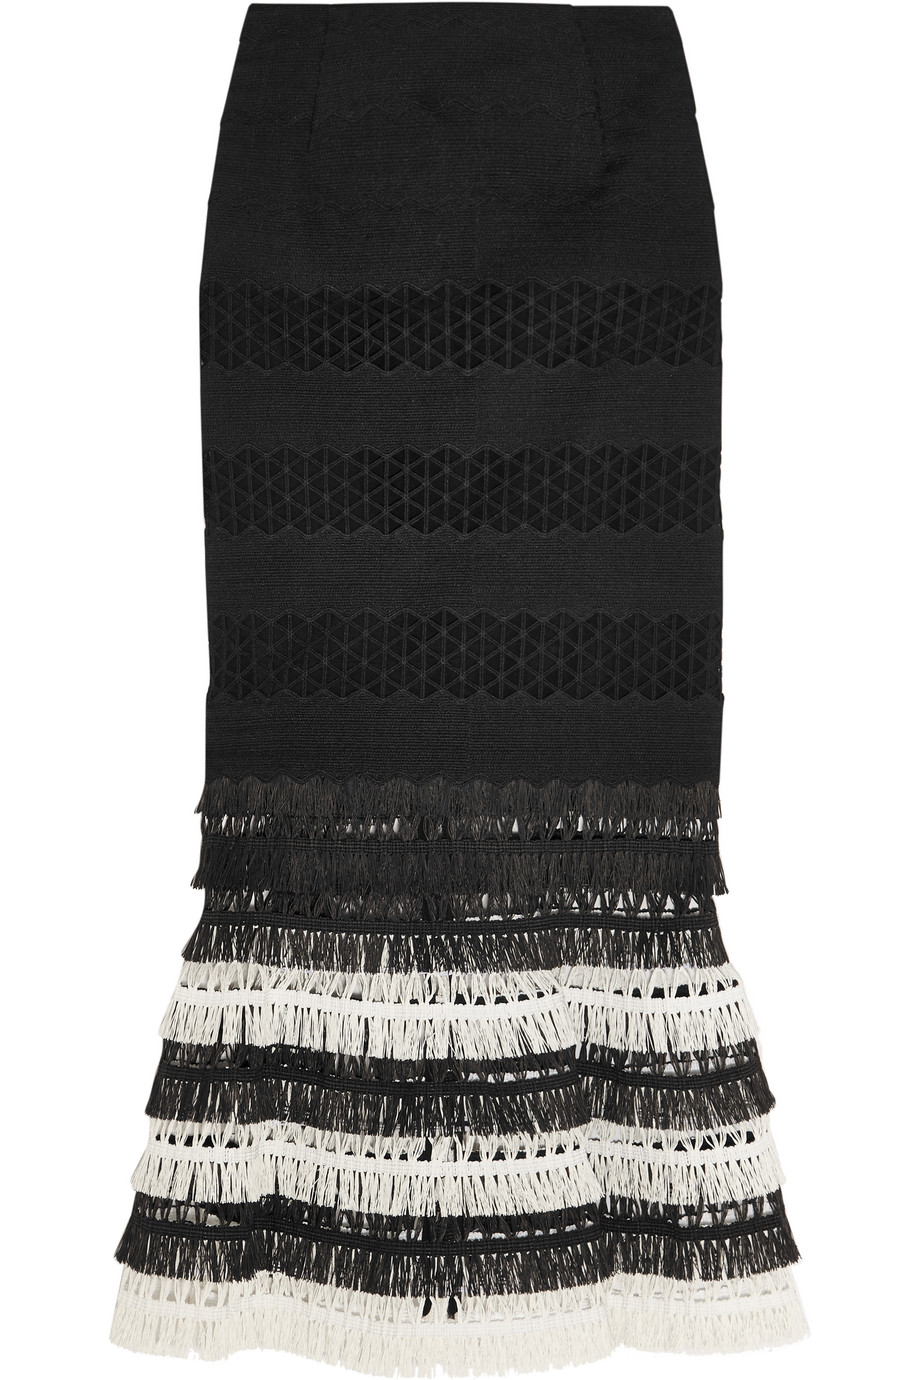 Fringed Macramé Skirt, Jonathan Simkhai, Black, Women's, Size: 6